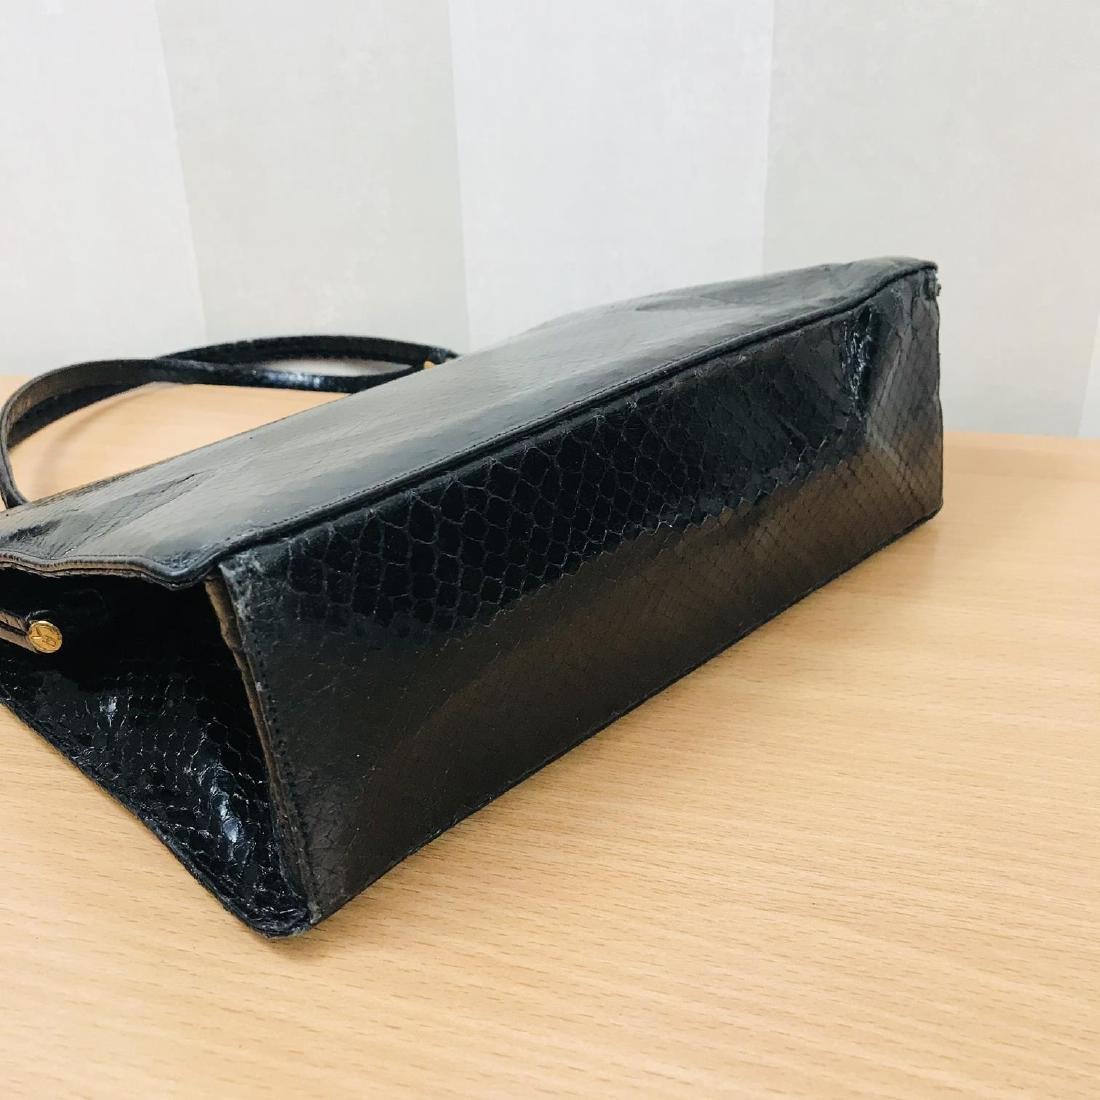 Vintage Black Snakeskin Leather Handbag - 8